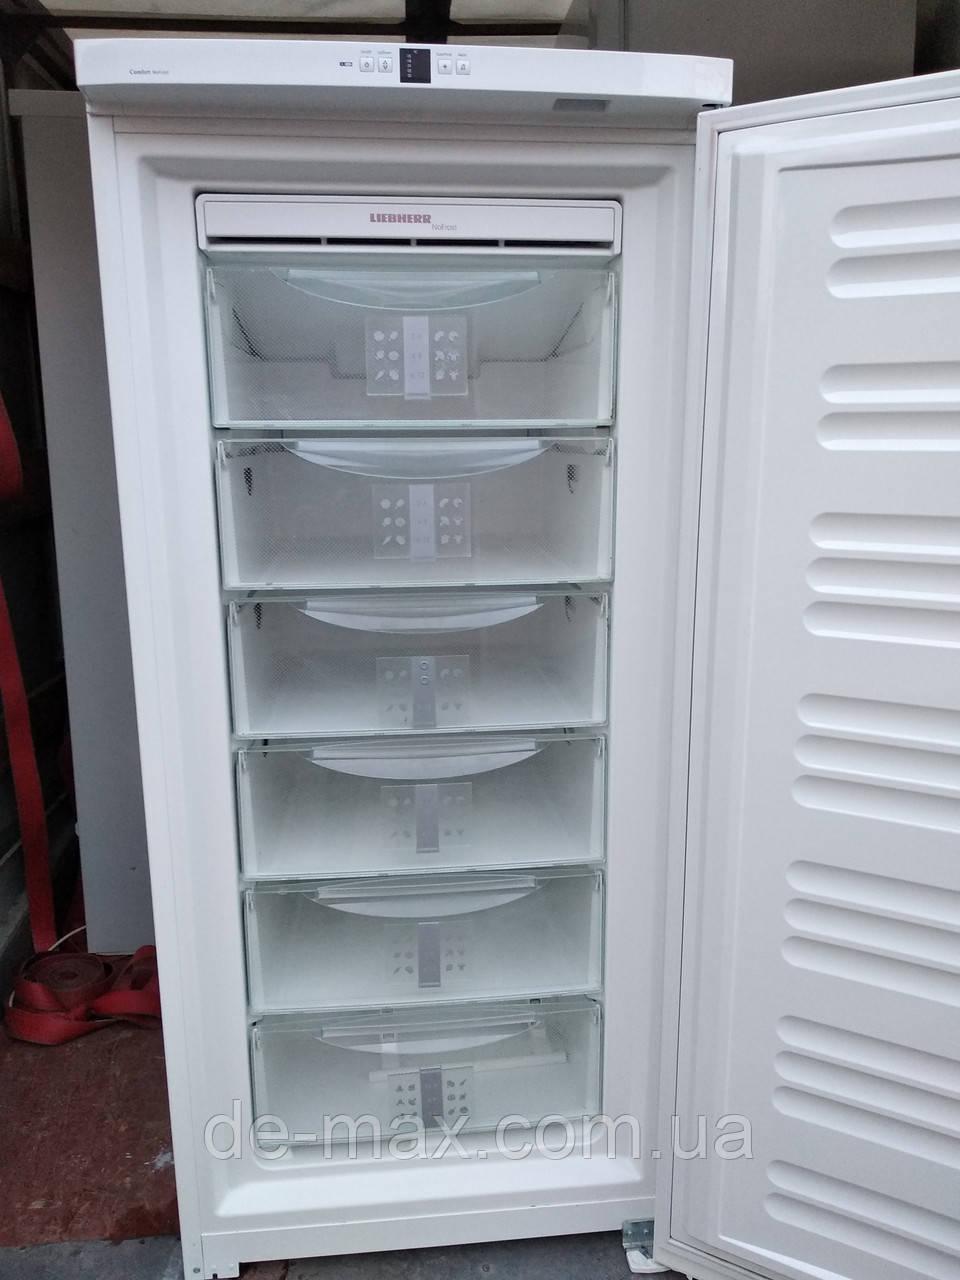 Морозильная камера Либхер Liebherr GN 3113 No Frost 307л А++ дисплей